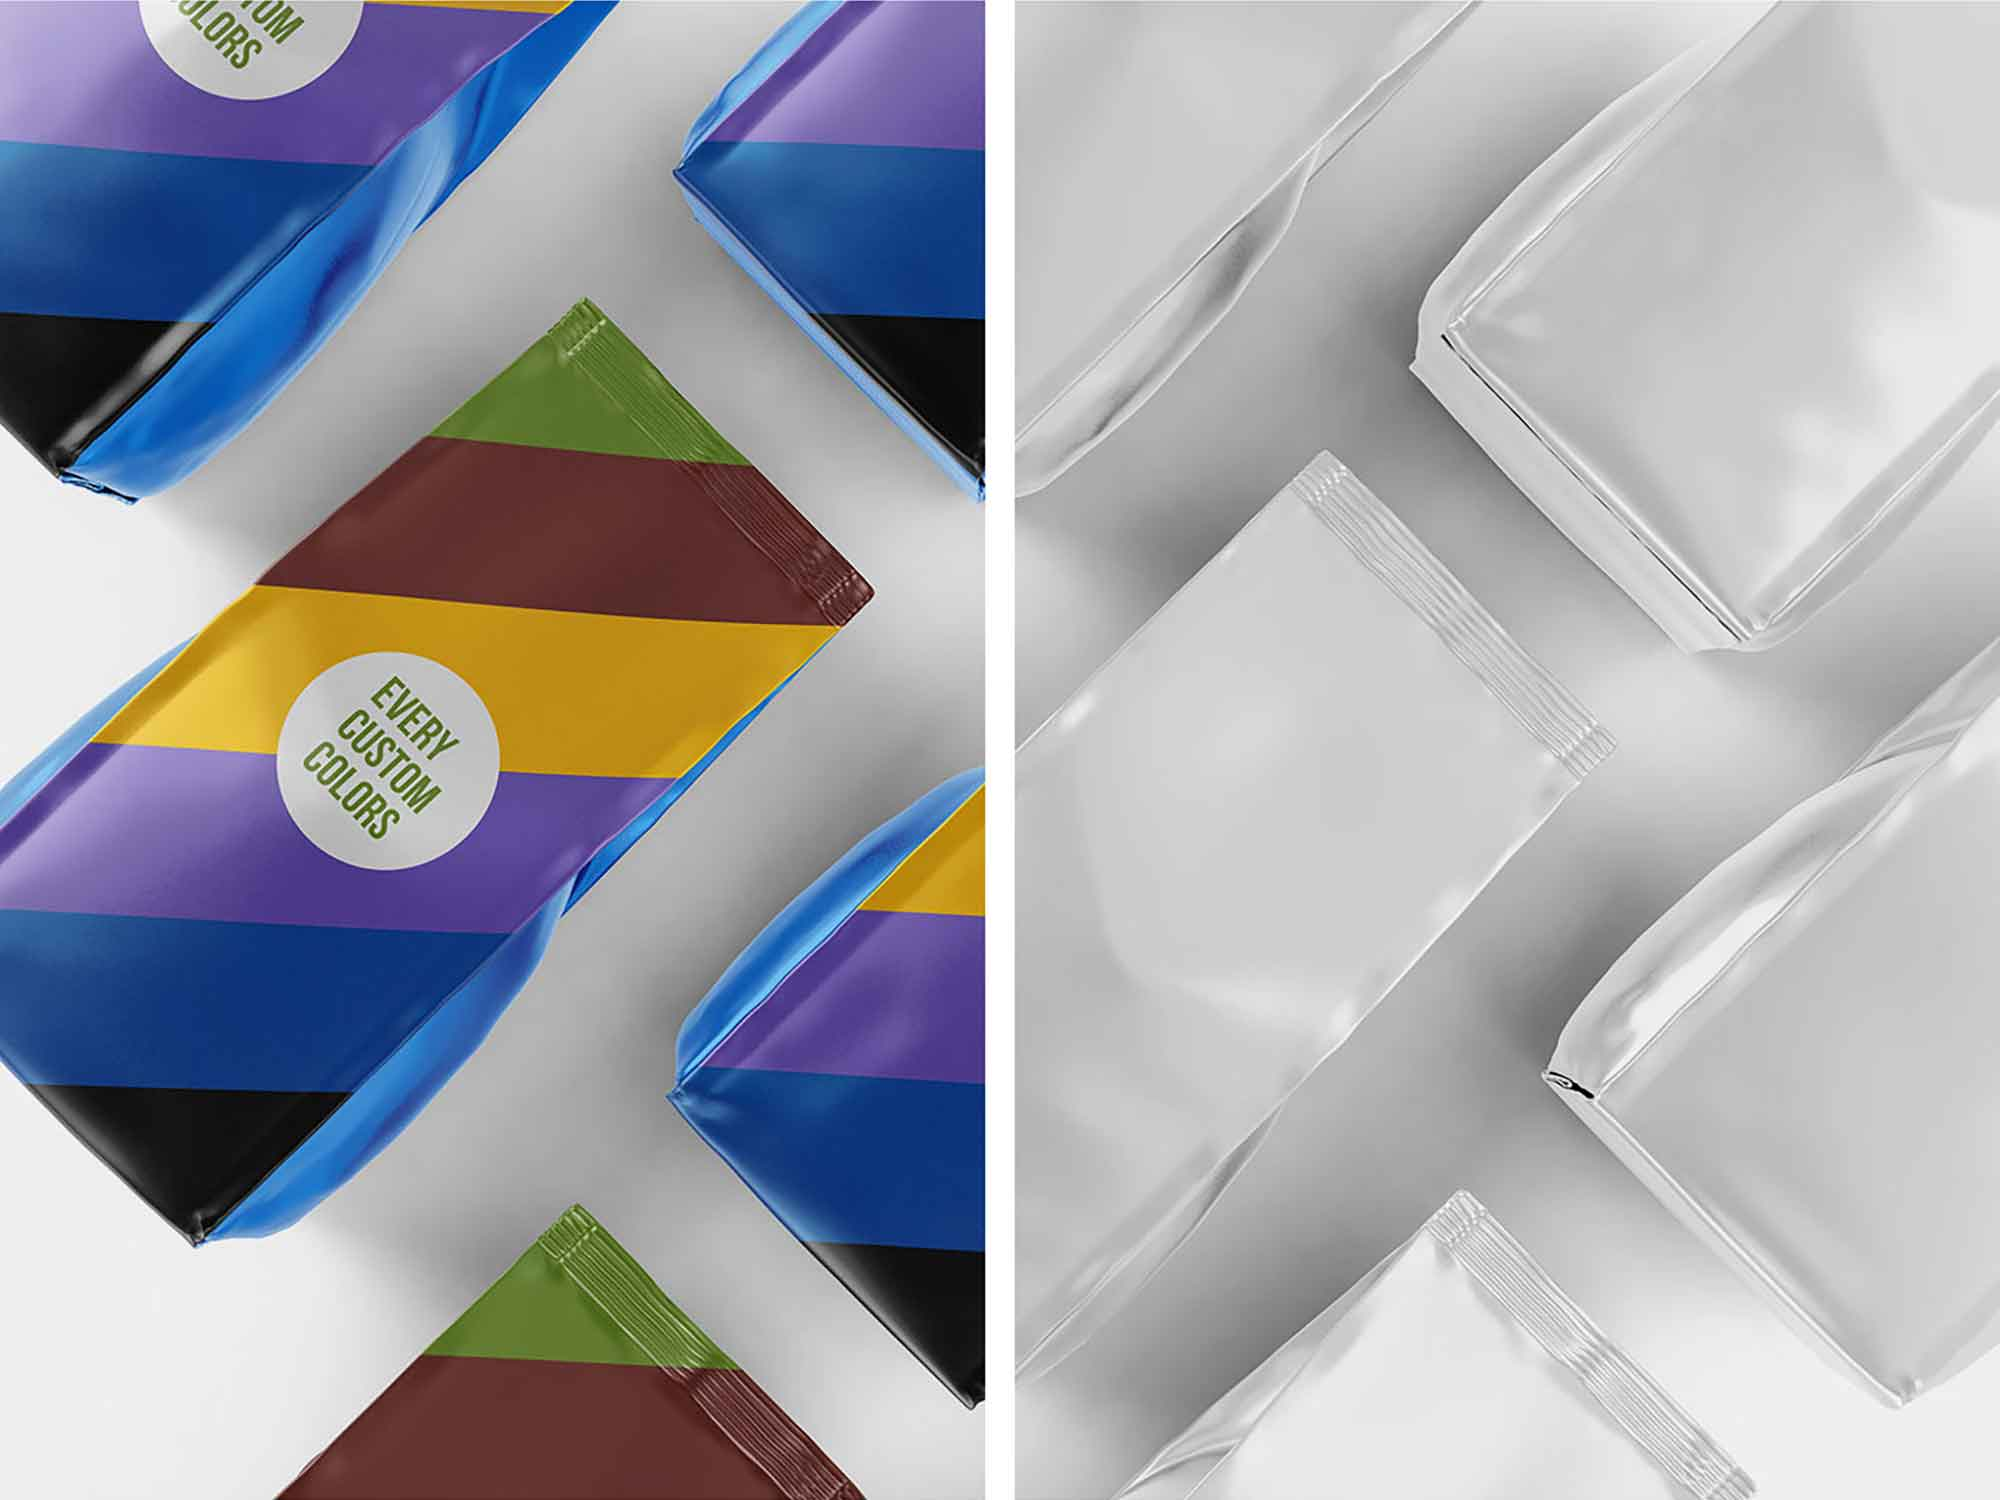 Aluminum Coffee Packaging Mockup 2